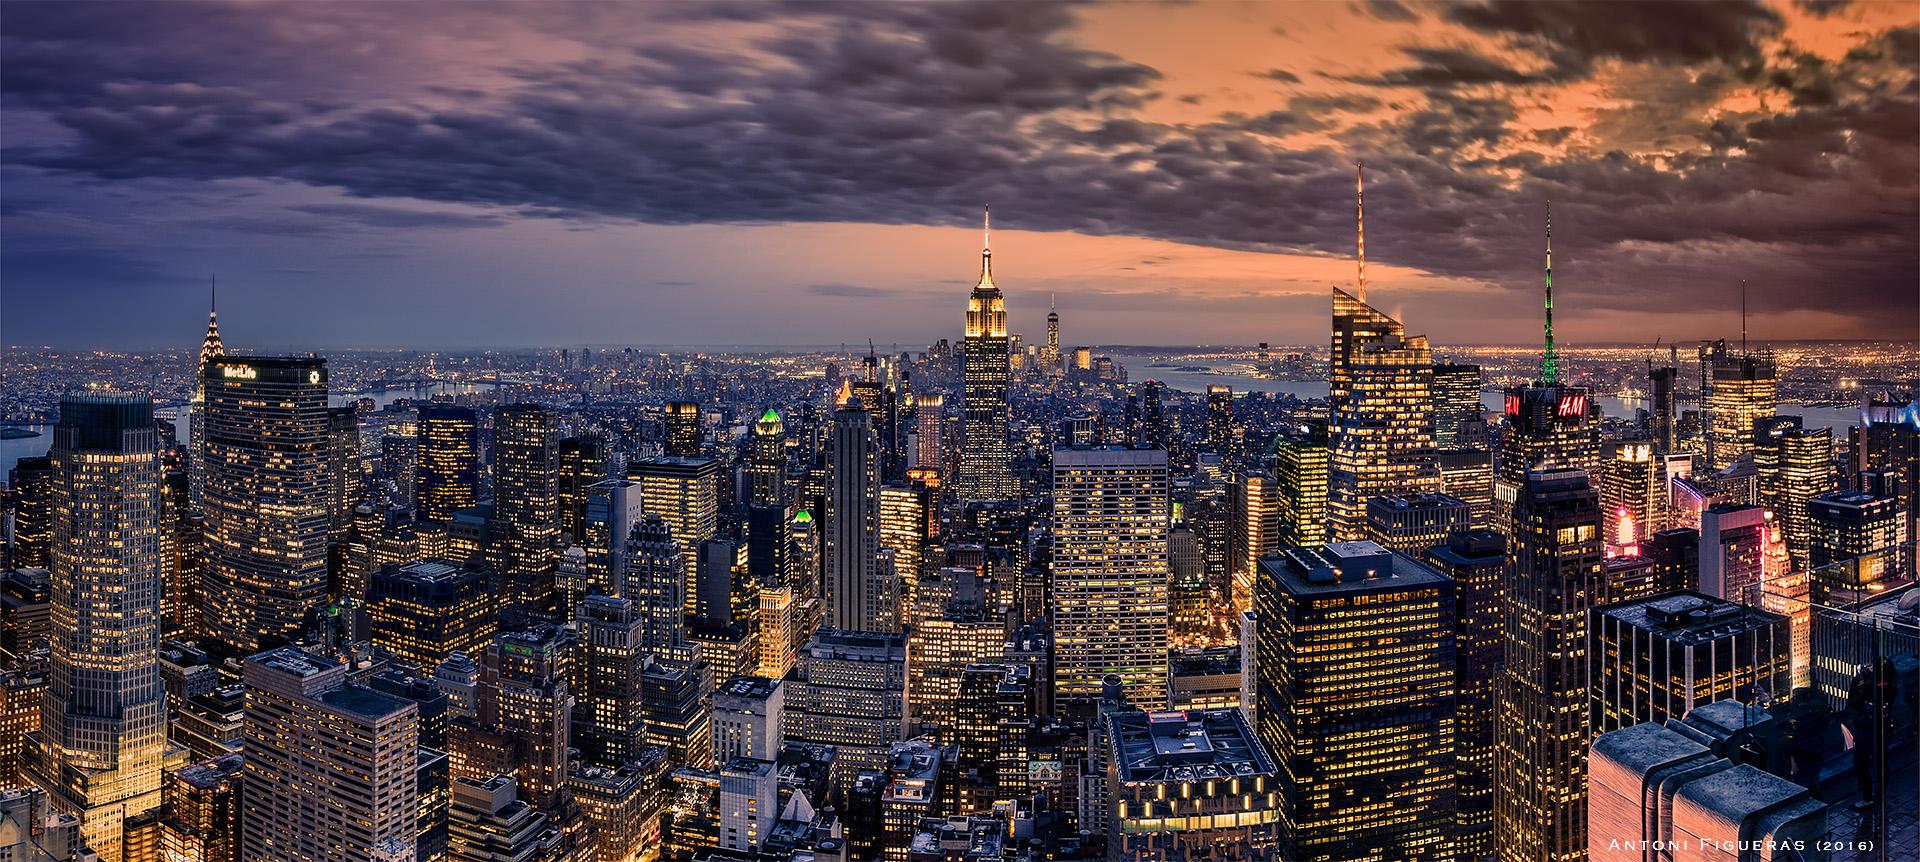 New York in Cinemascope, USA